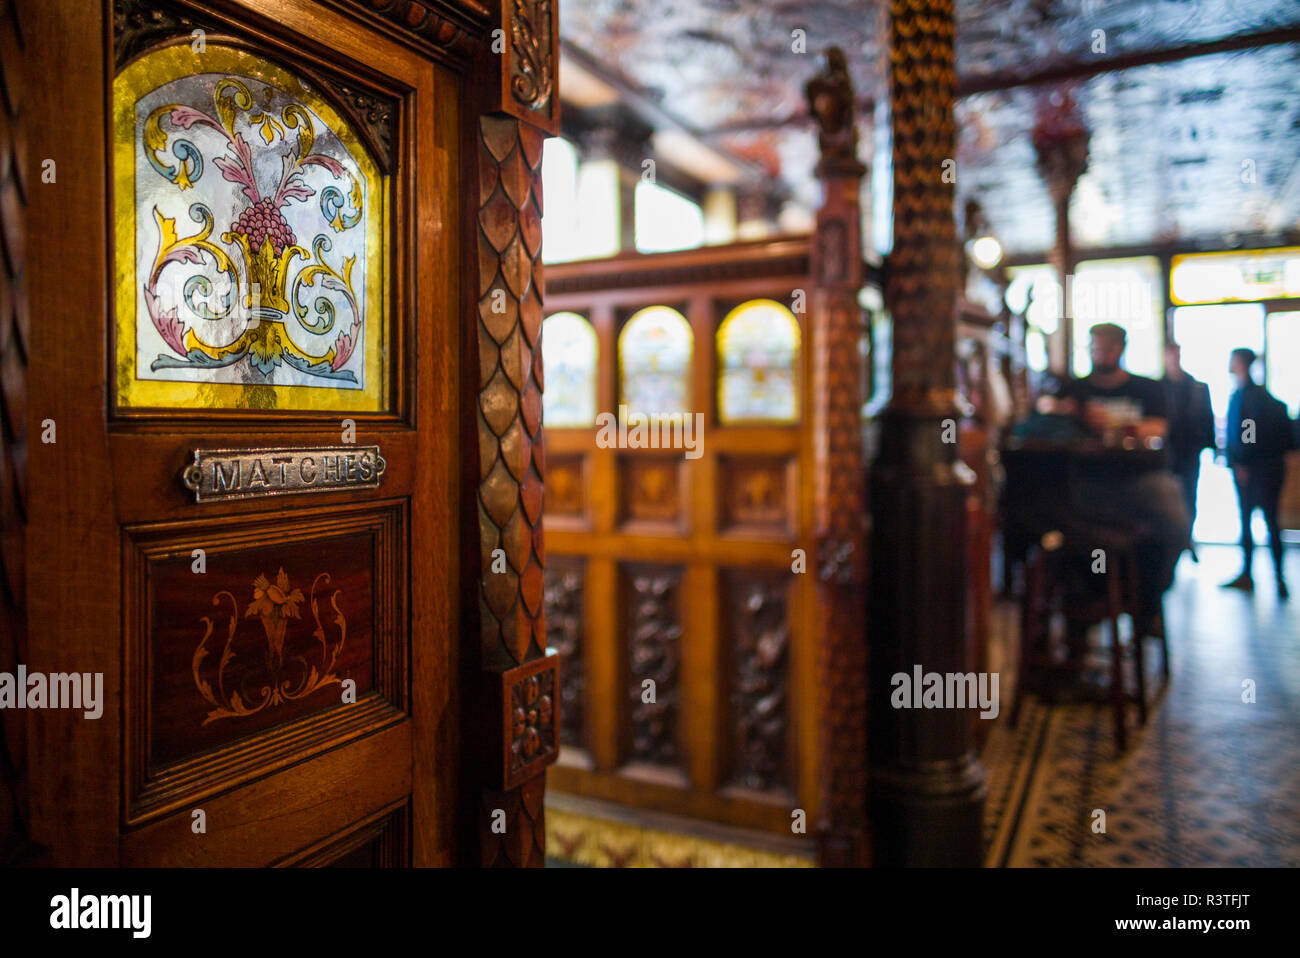 UK, Northern Ireland, Belfast, Crown Liquor Saloon, historic 1885 bar, unique private bar rooms called snugs - Stock Image